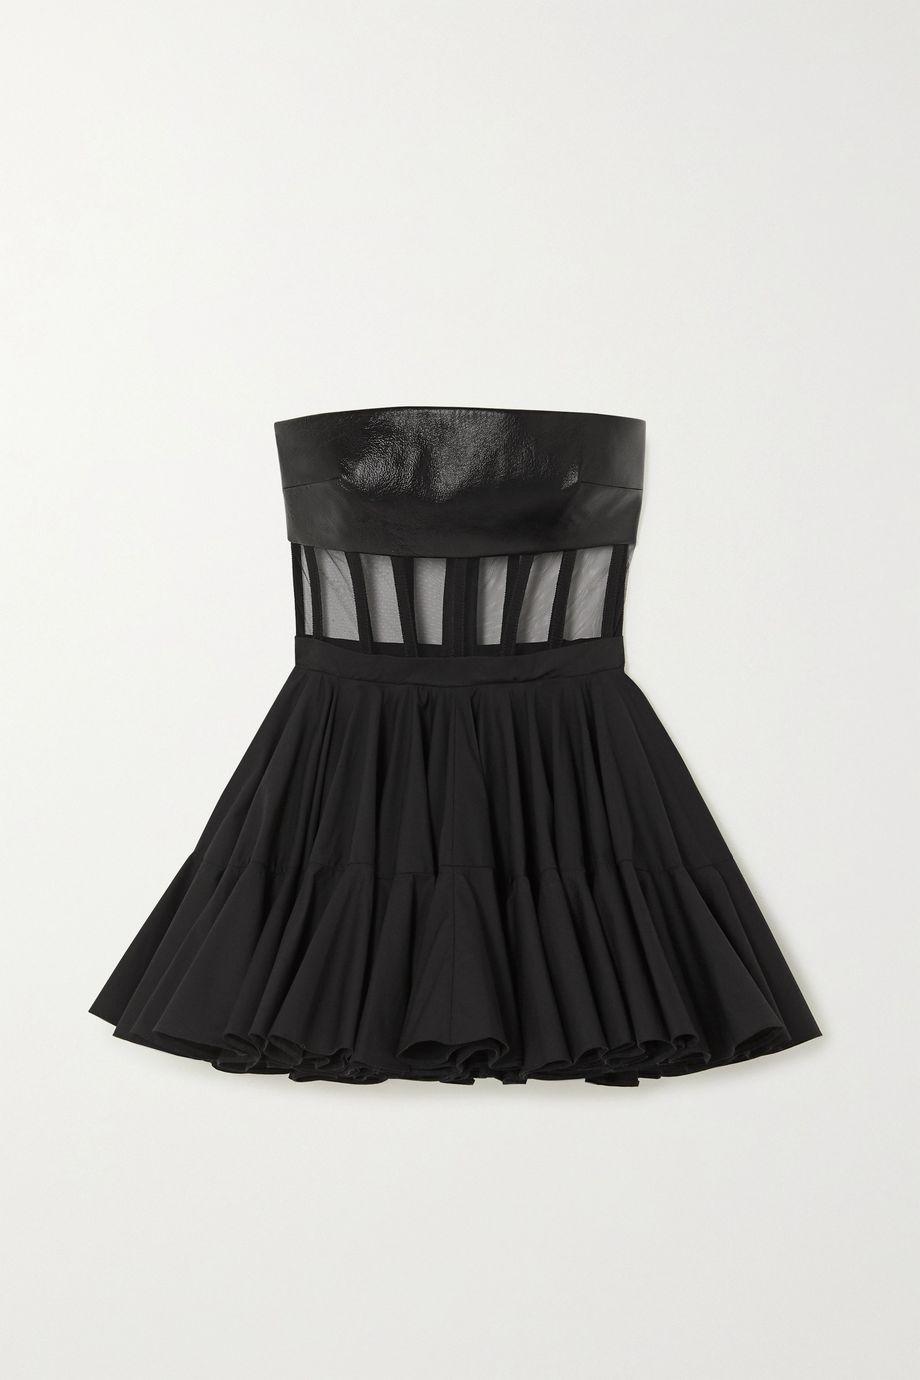 David Koma Grosgrain-trimmed leather, tulle and cotton-poplin mini dress